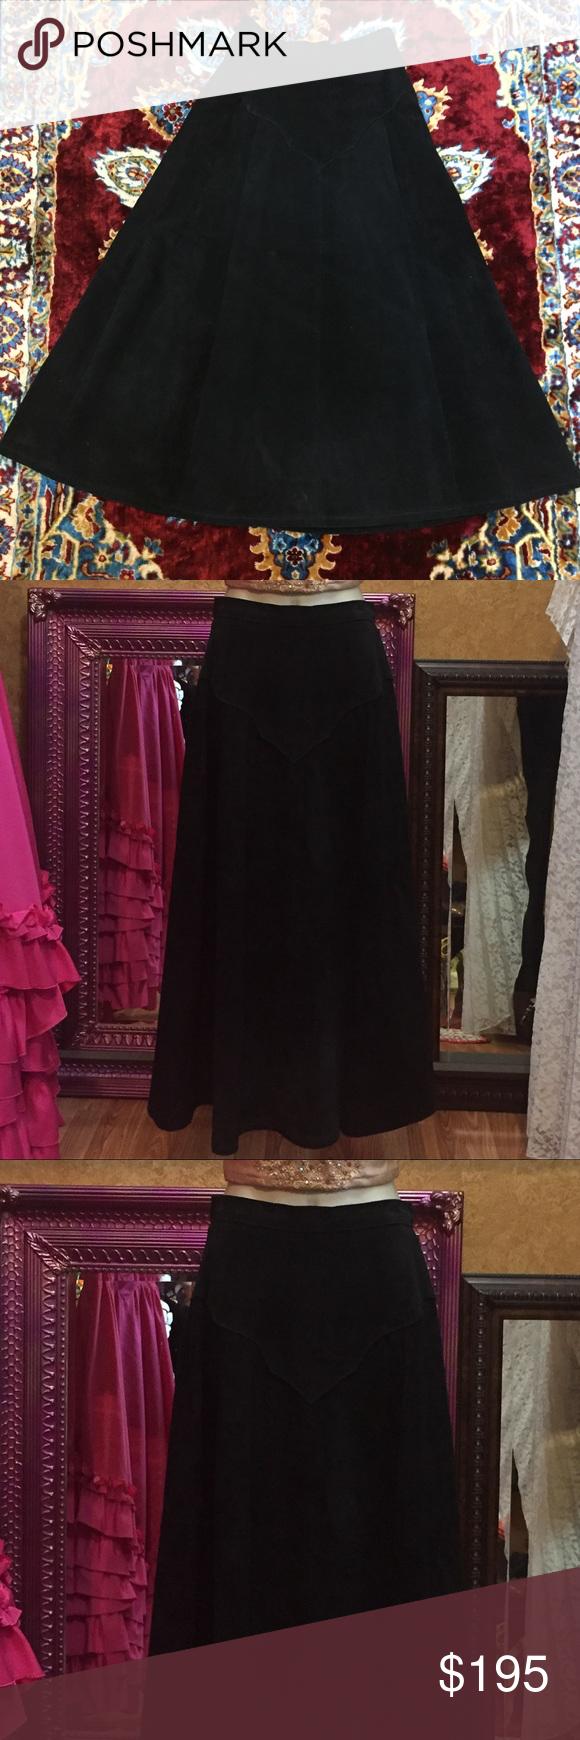 Vintage s western black suede leather skirt goth boutique